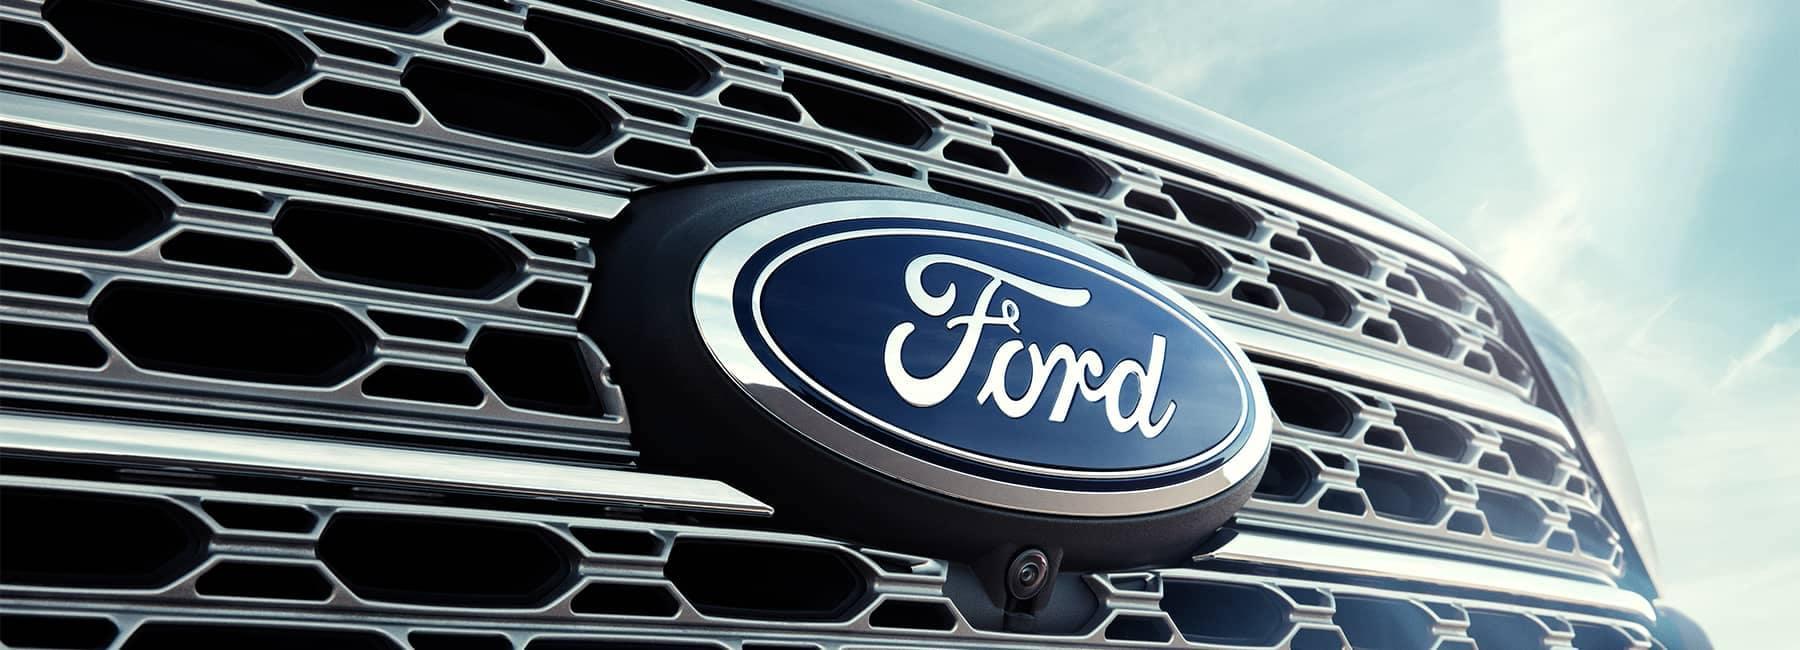 2021 Ford Explorer front grille_mobile